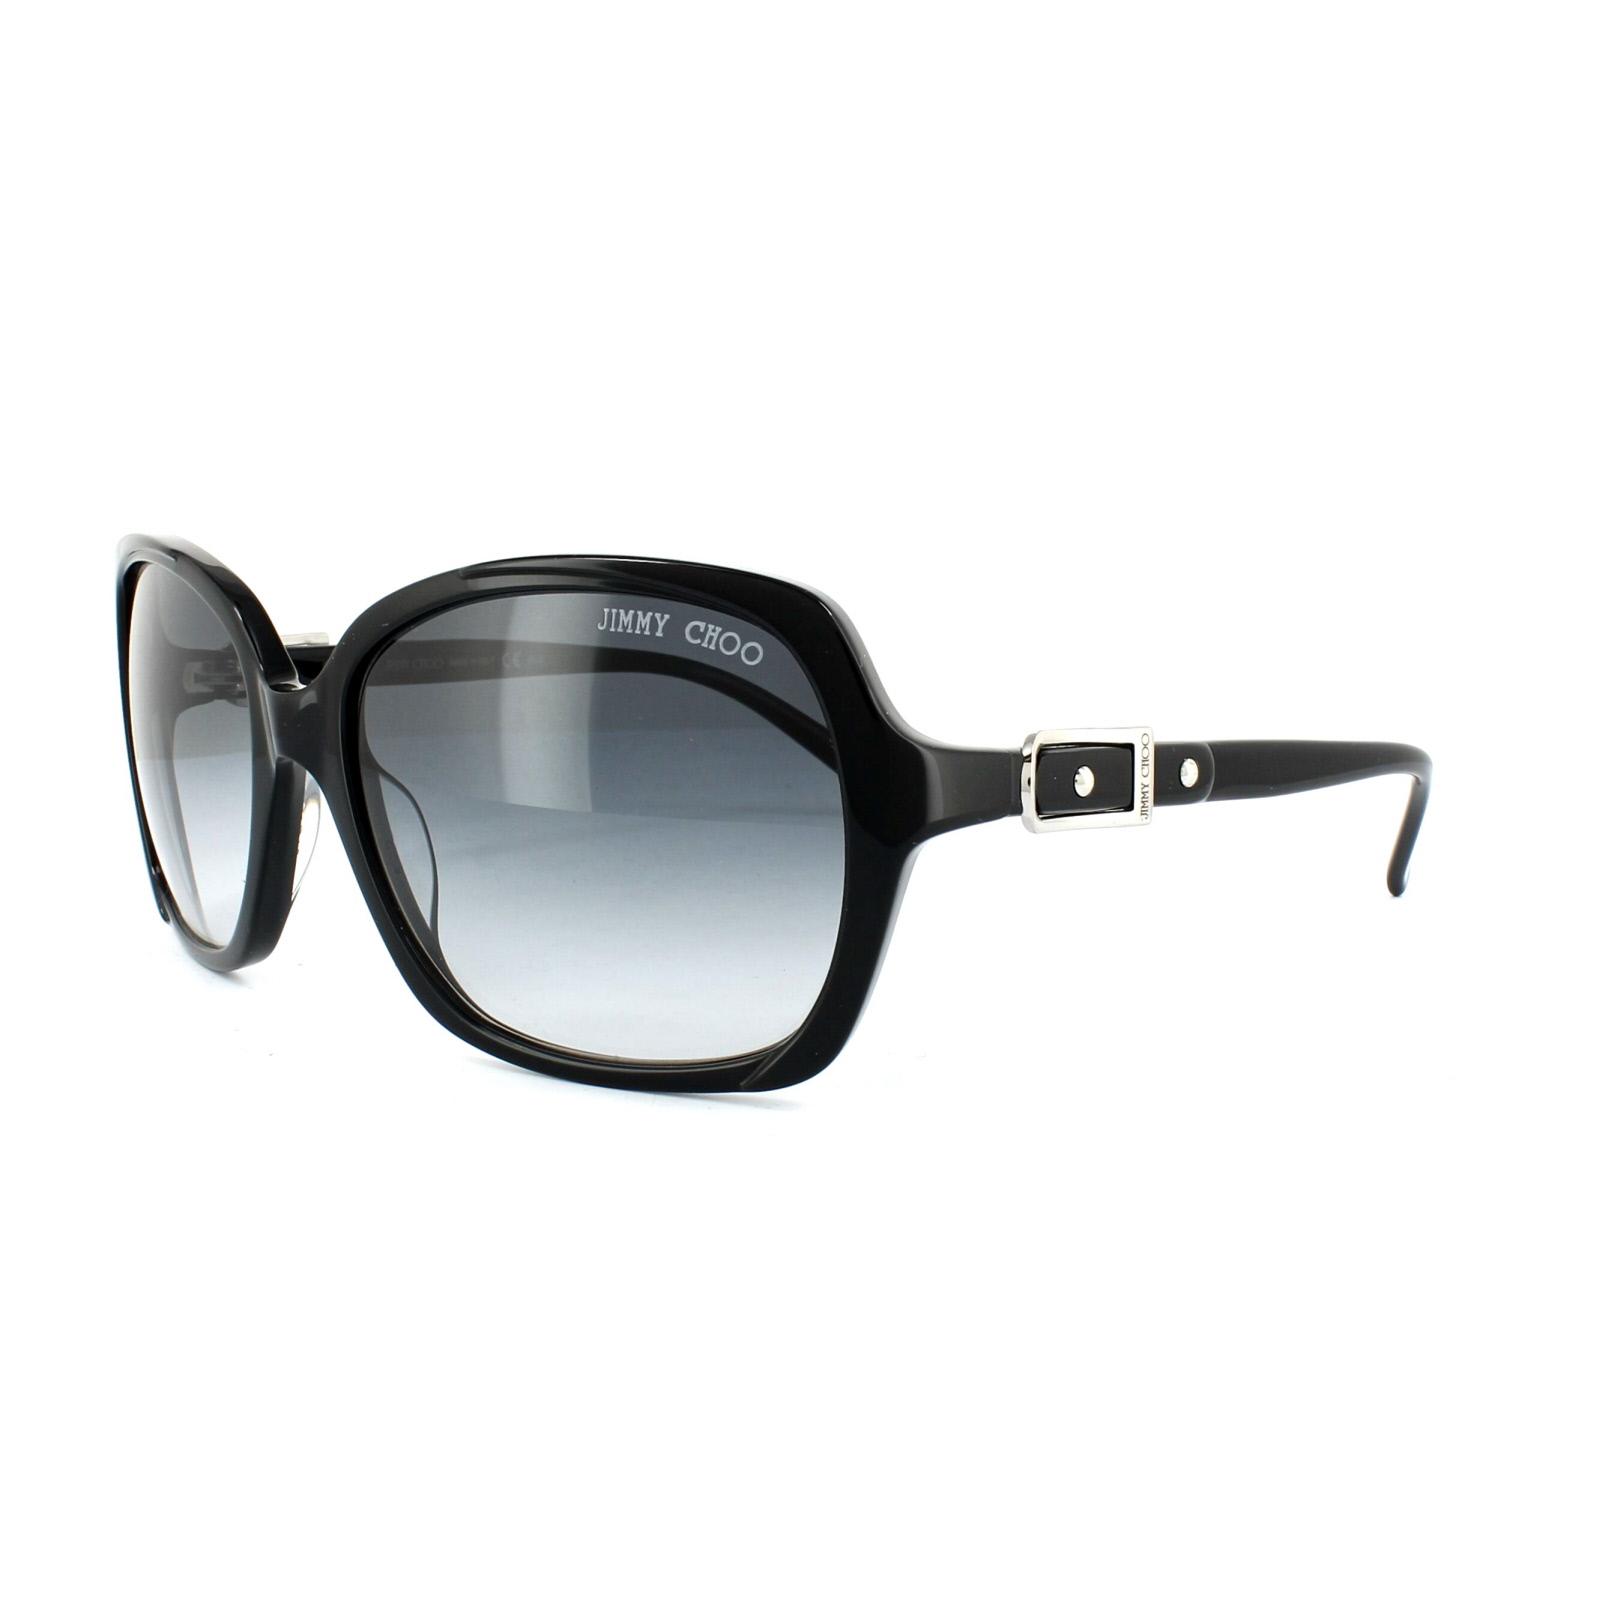 b6943e27bc9 Jimmy Choo Sunglasses Lela 807 JJ Black Grey Gradient 827886872848 ...